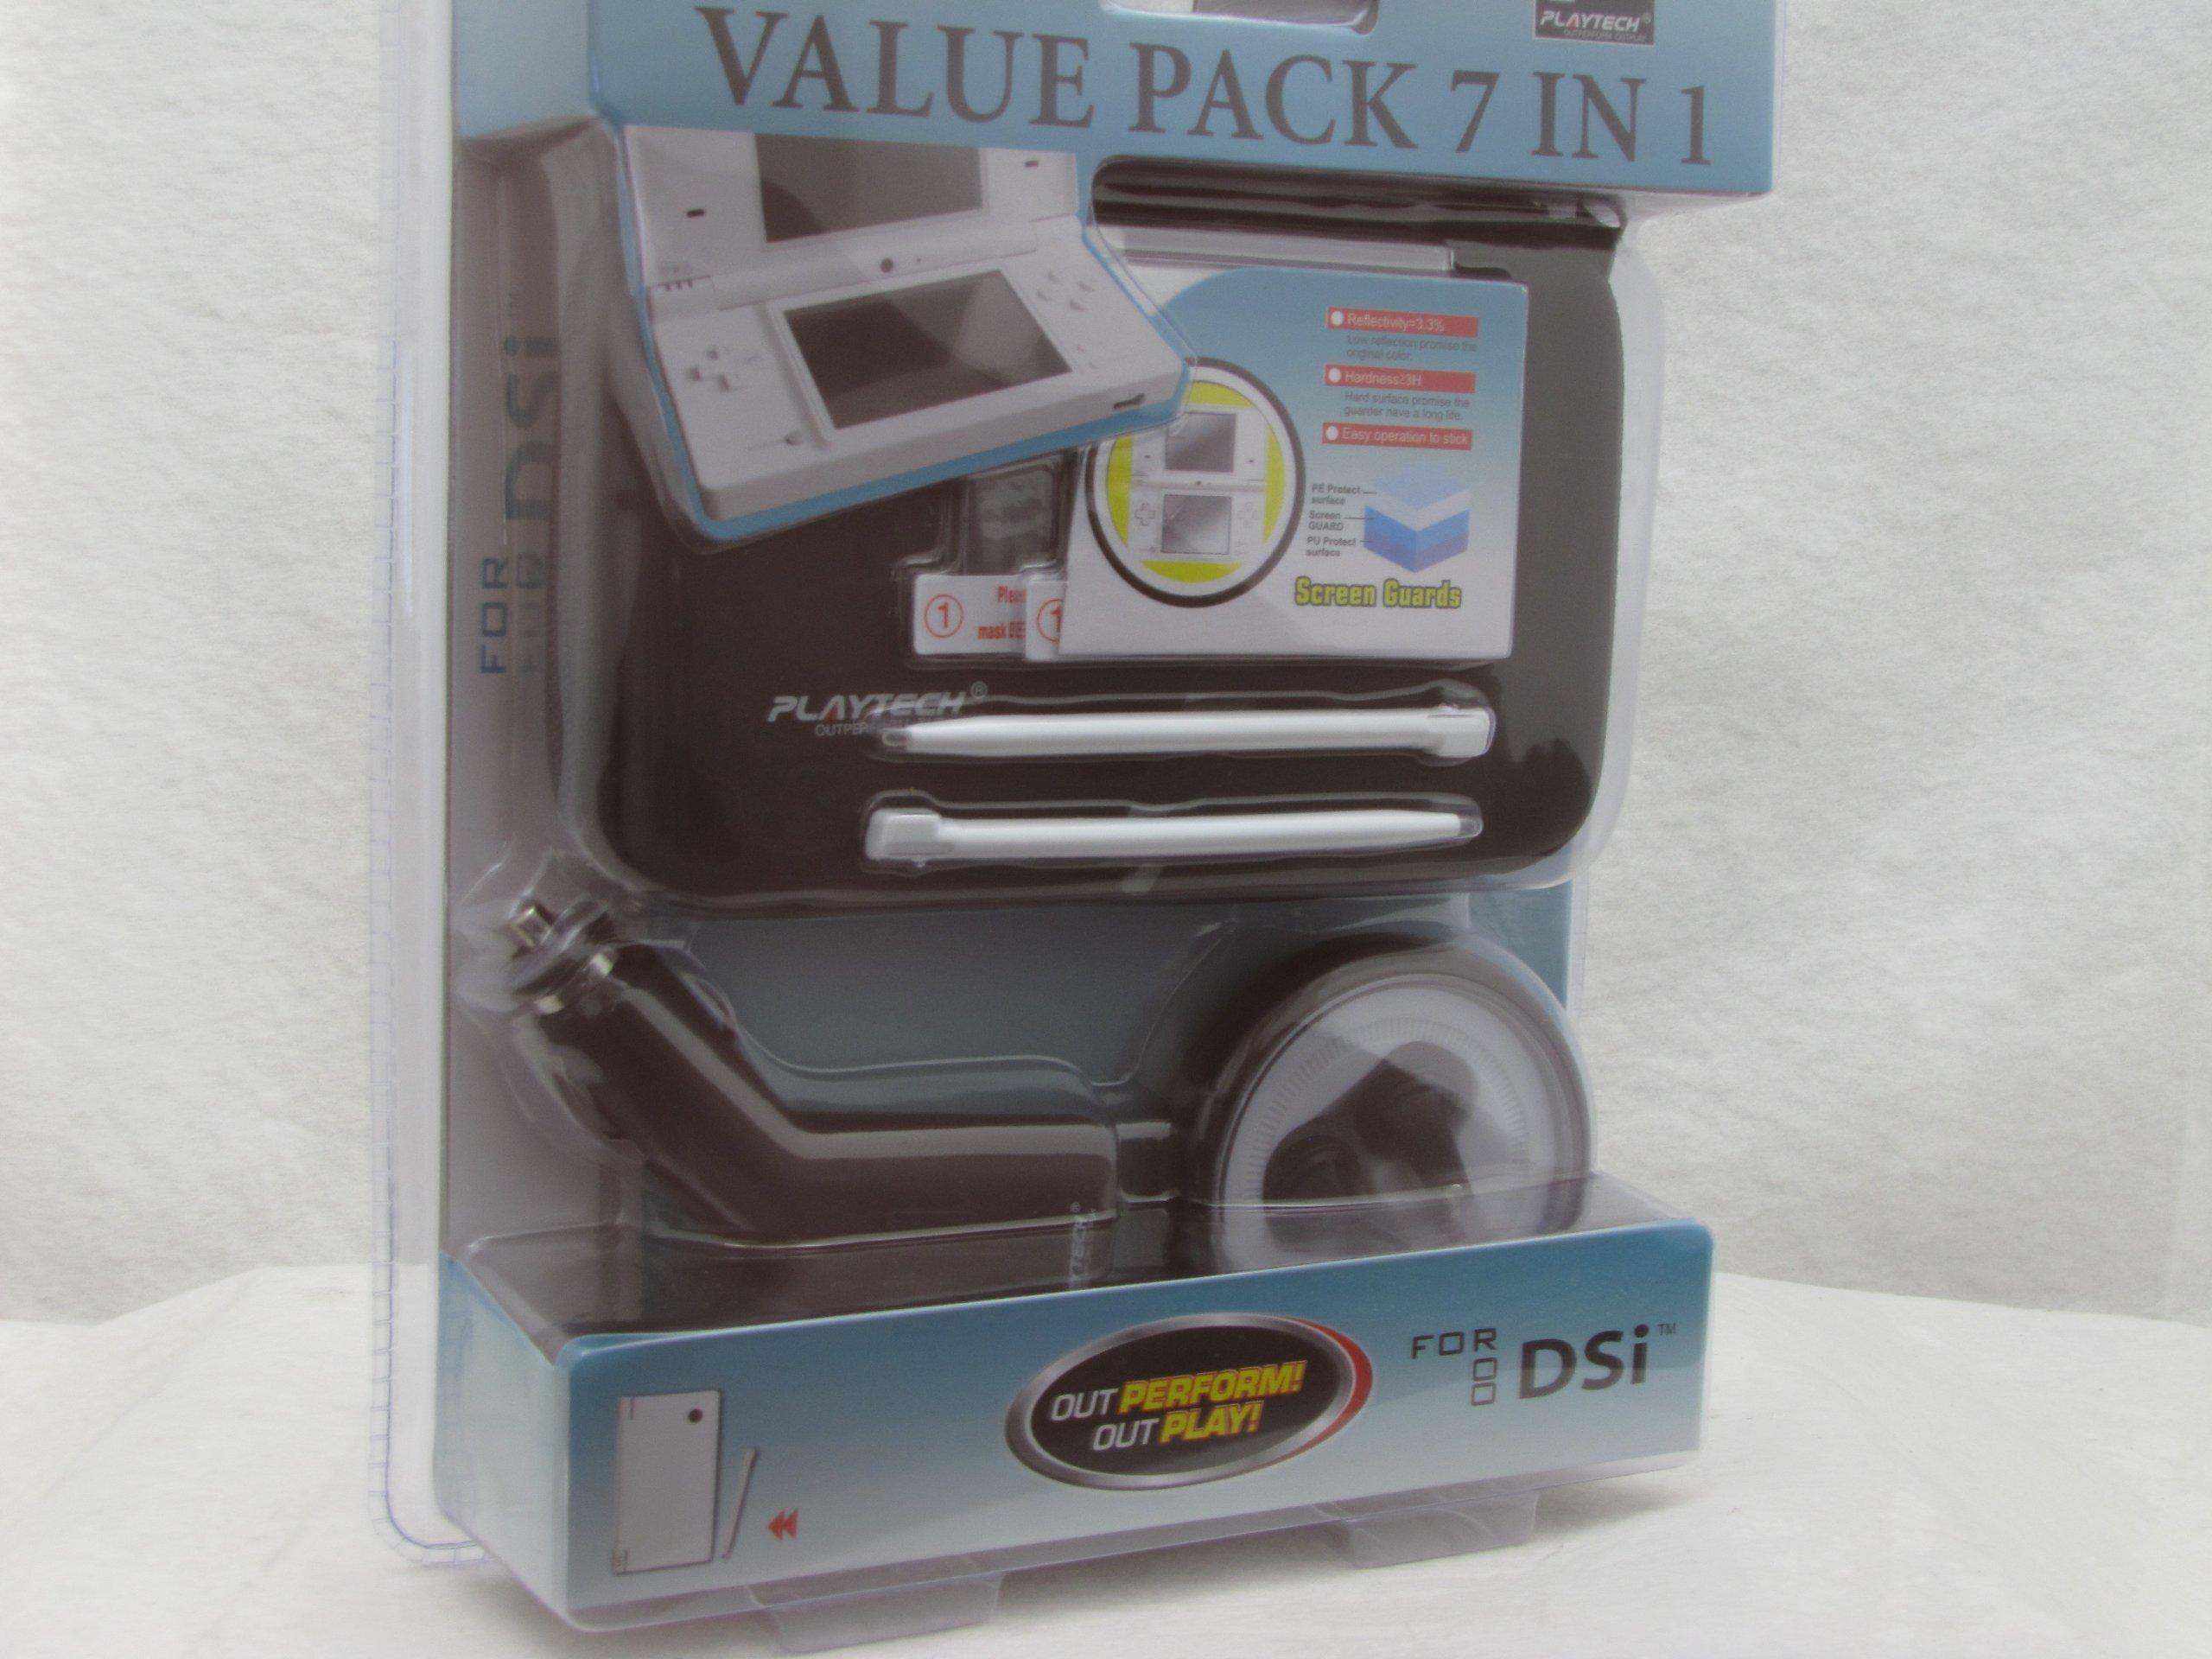 Nintendo DS Lite Hard Universal Travel Case Protector + Charger Set-7 in 1 Vlaue Pack-Black